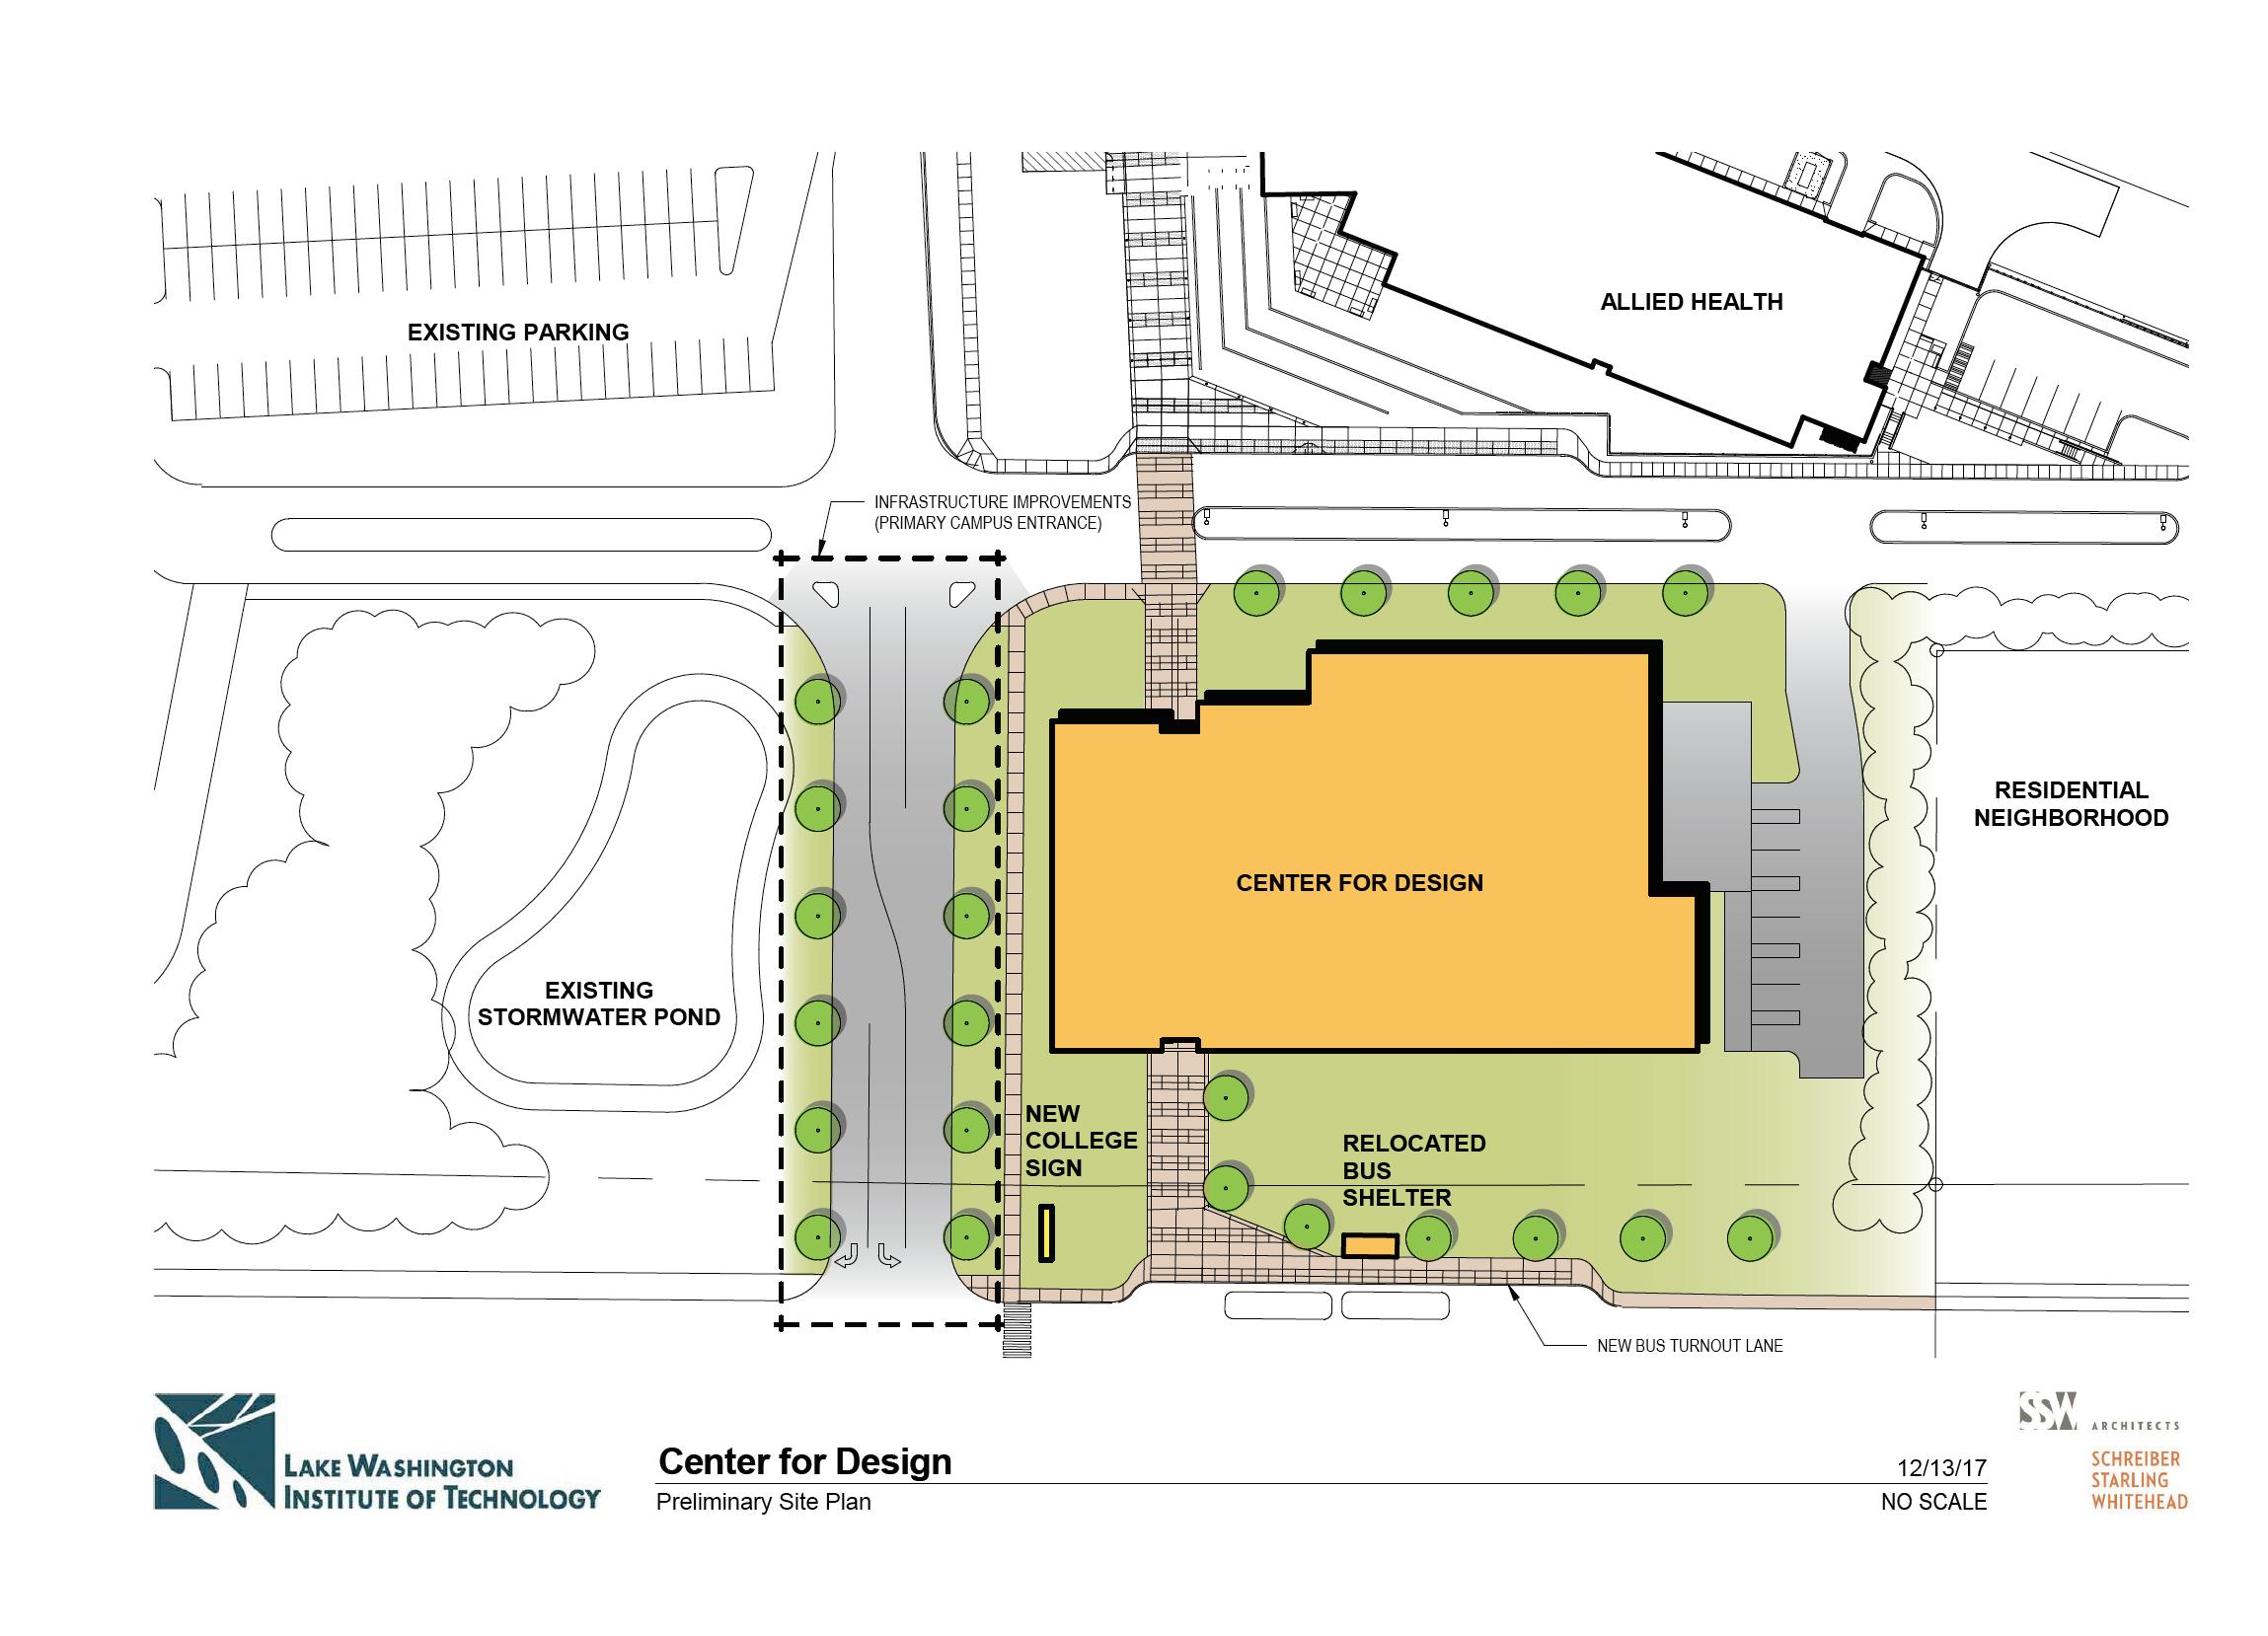 Center for Design Preliminary Footprint